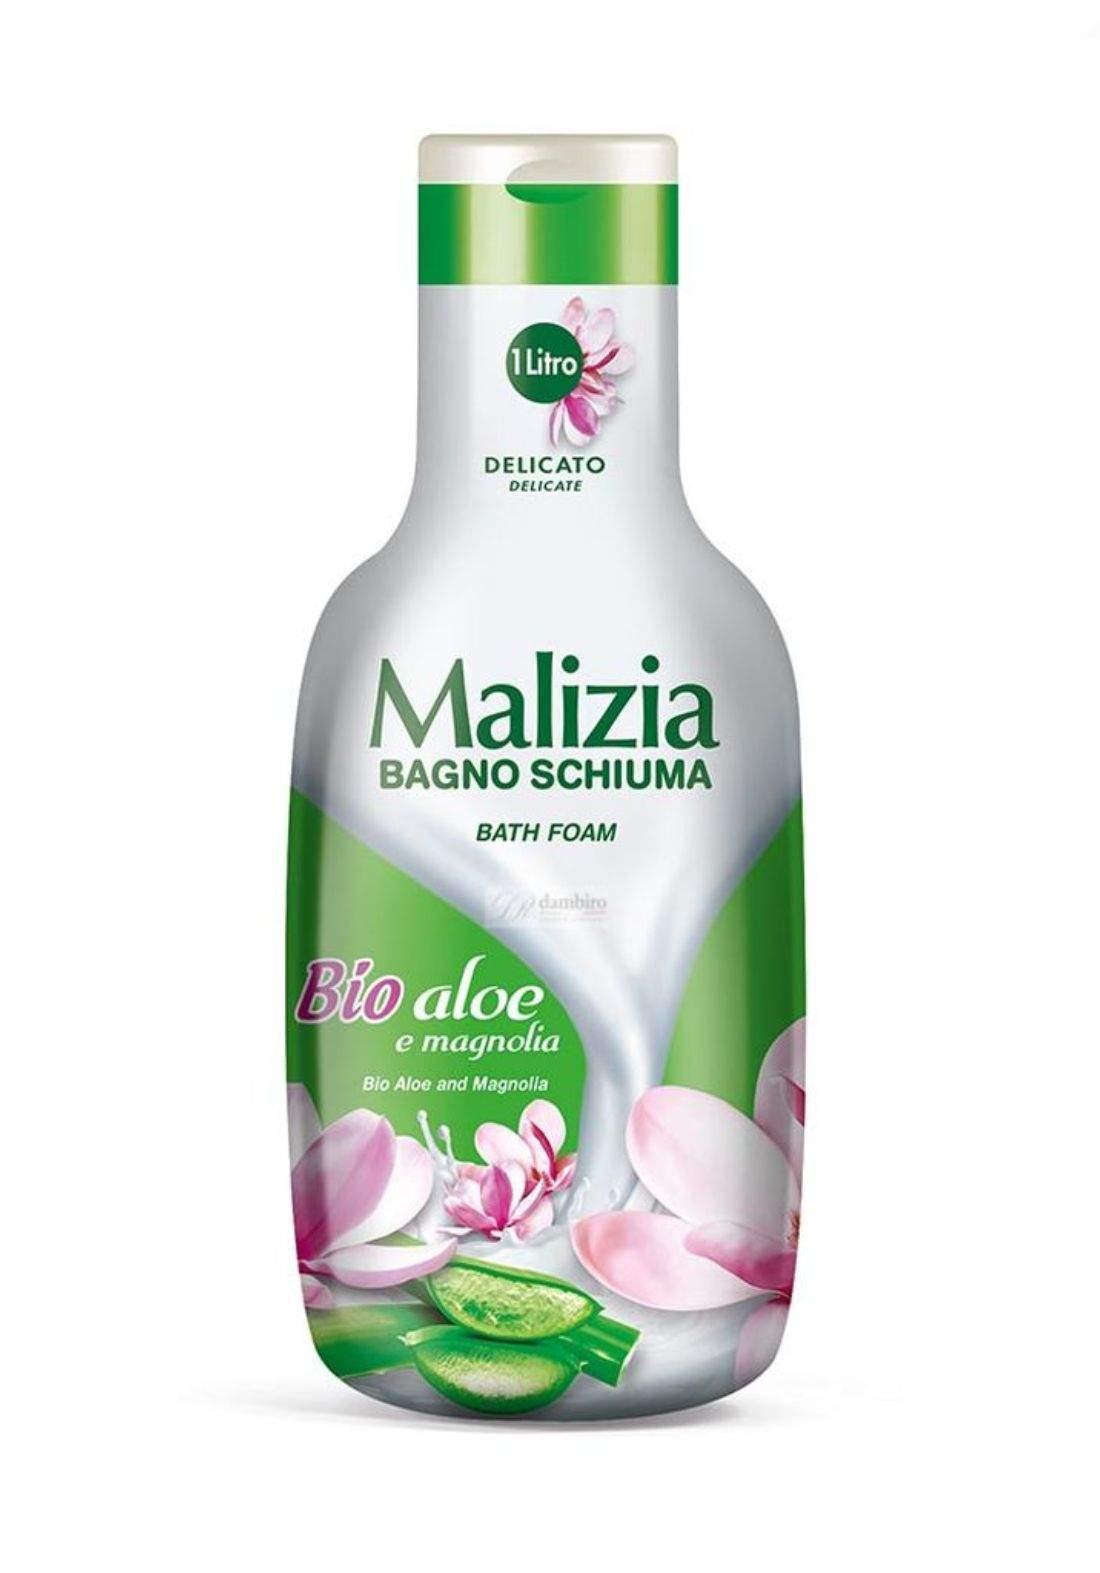 Malizia Body Wash 1L غسول الجسم ماليزيا